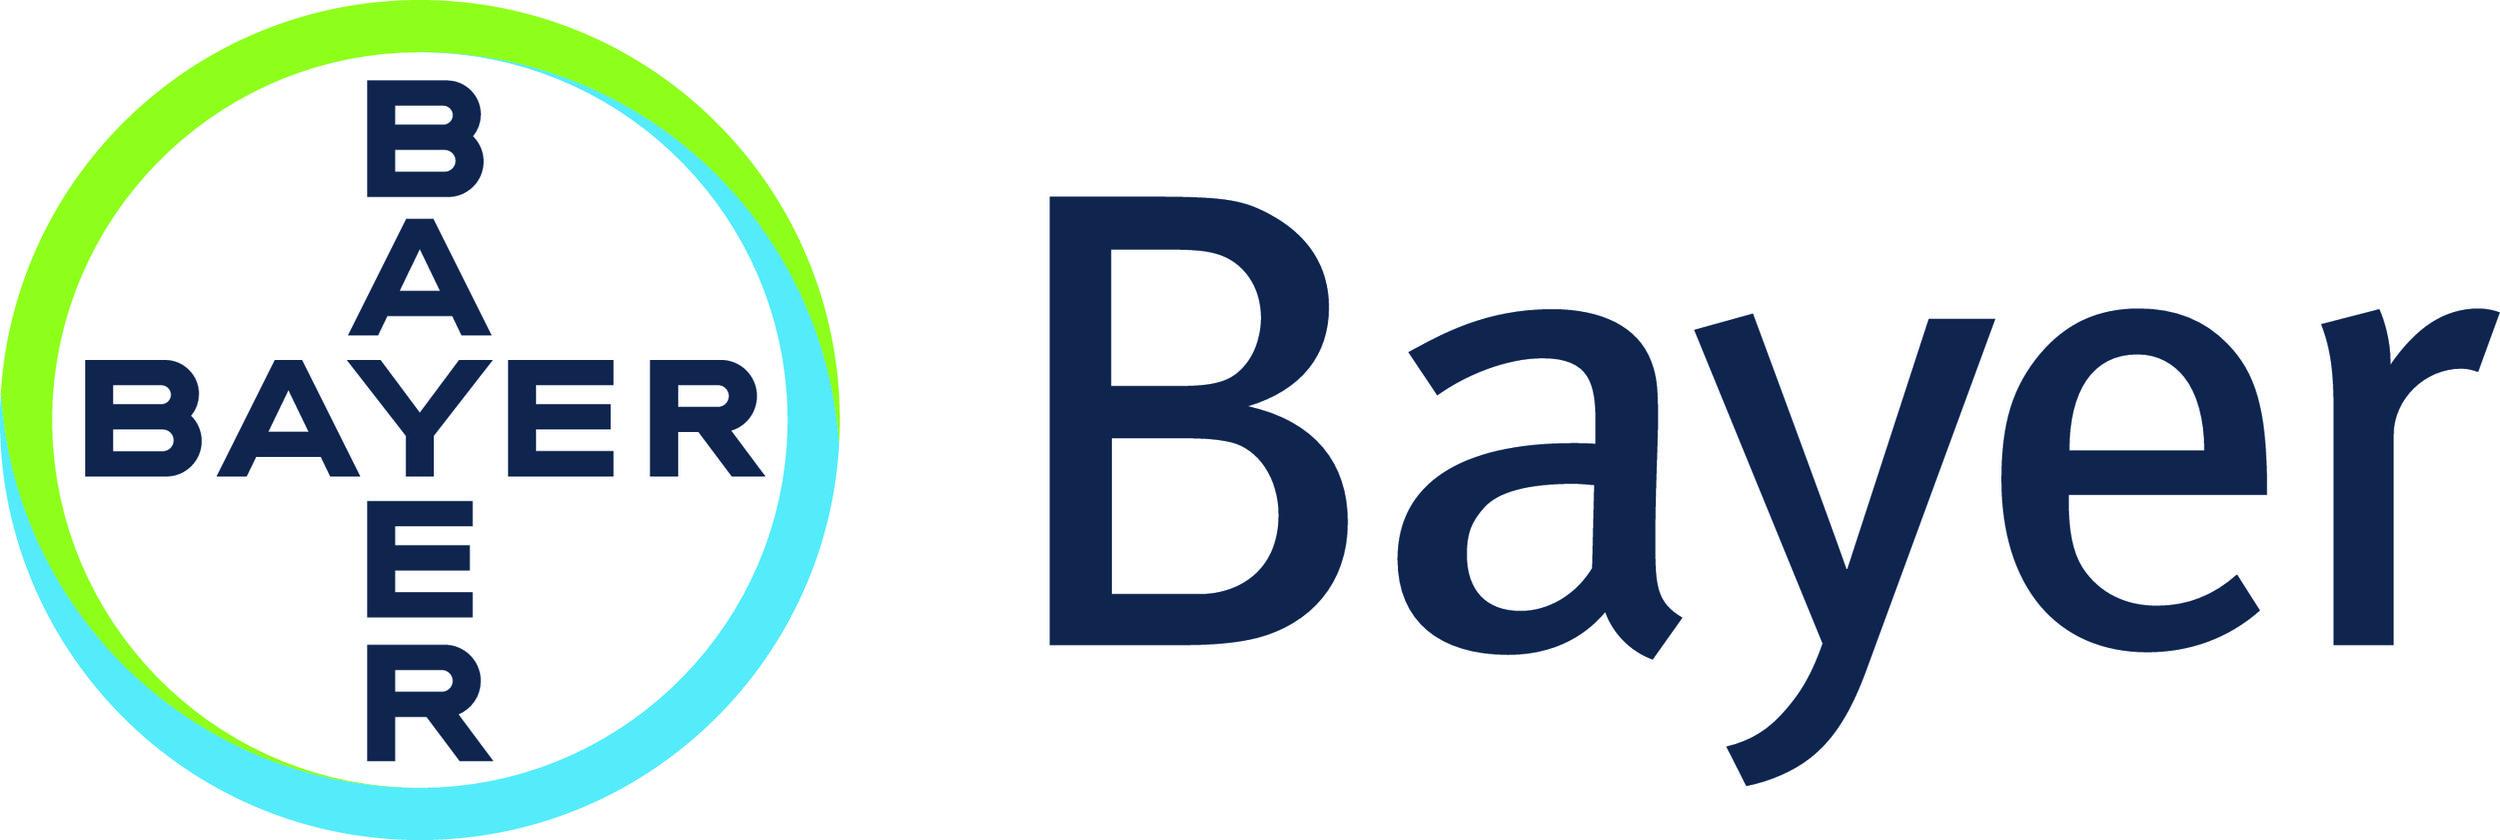 Corp-Logo_BG_Bayer-Cross-LType_Basic_print_PMS.jpg